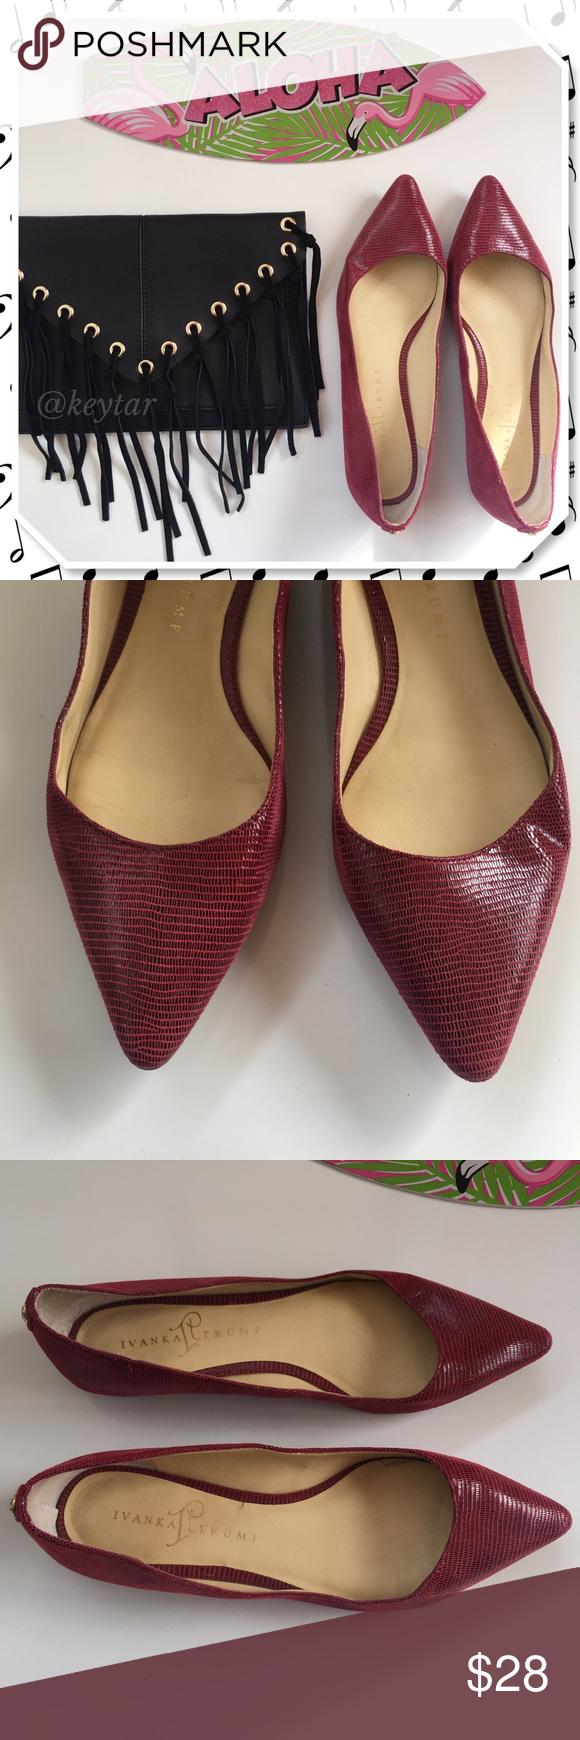 6ecce3943e3b Ivanka Trump Annulio Red Leather Snakeskin Flats A sleek and simple flat  from Ivanka Trump.